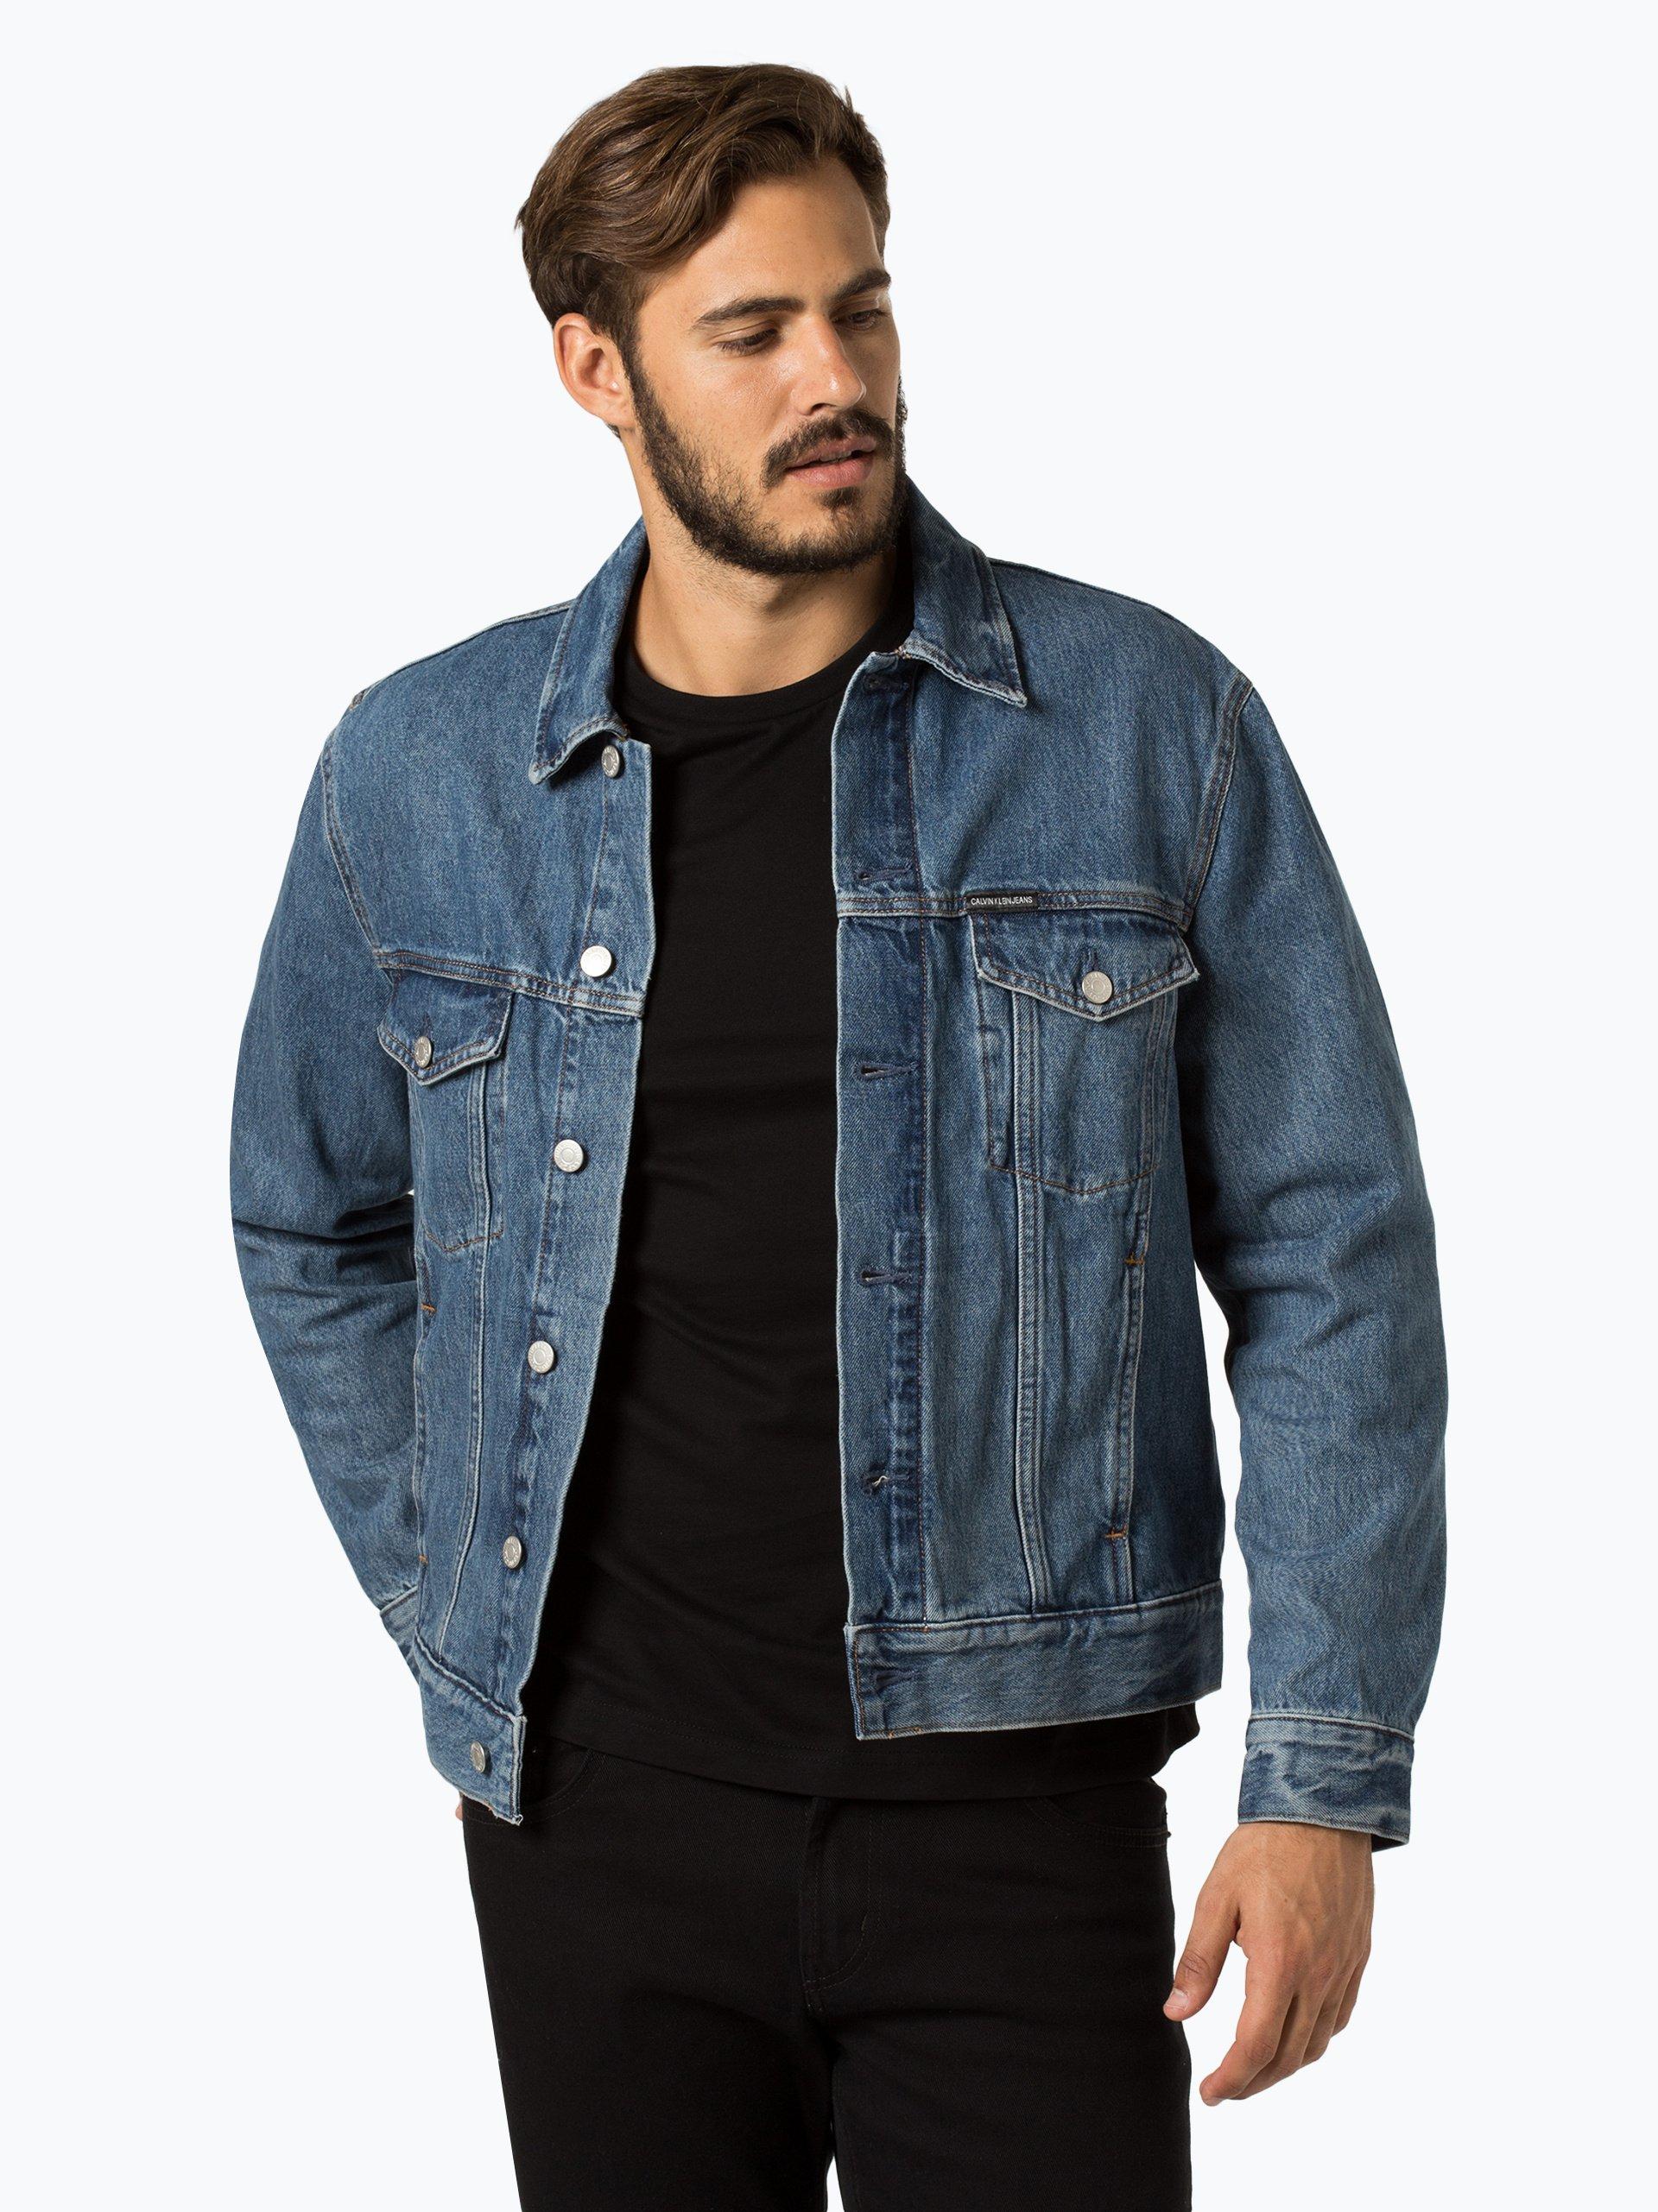 calvin klein jeans herren jeansjacke denim uni online kaufen vangraaf com. Black Bedroom Furniture Sets. Home Design Ideas